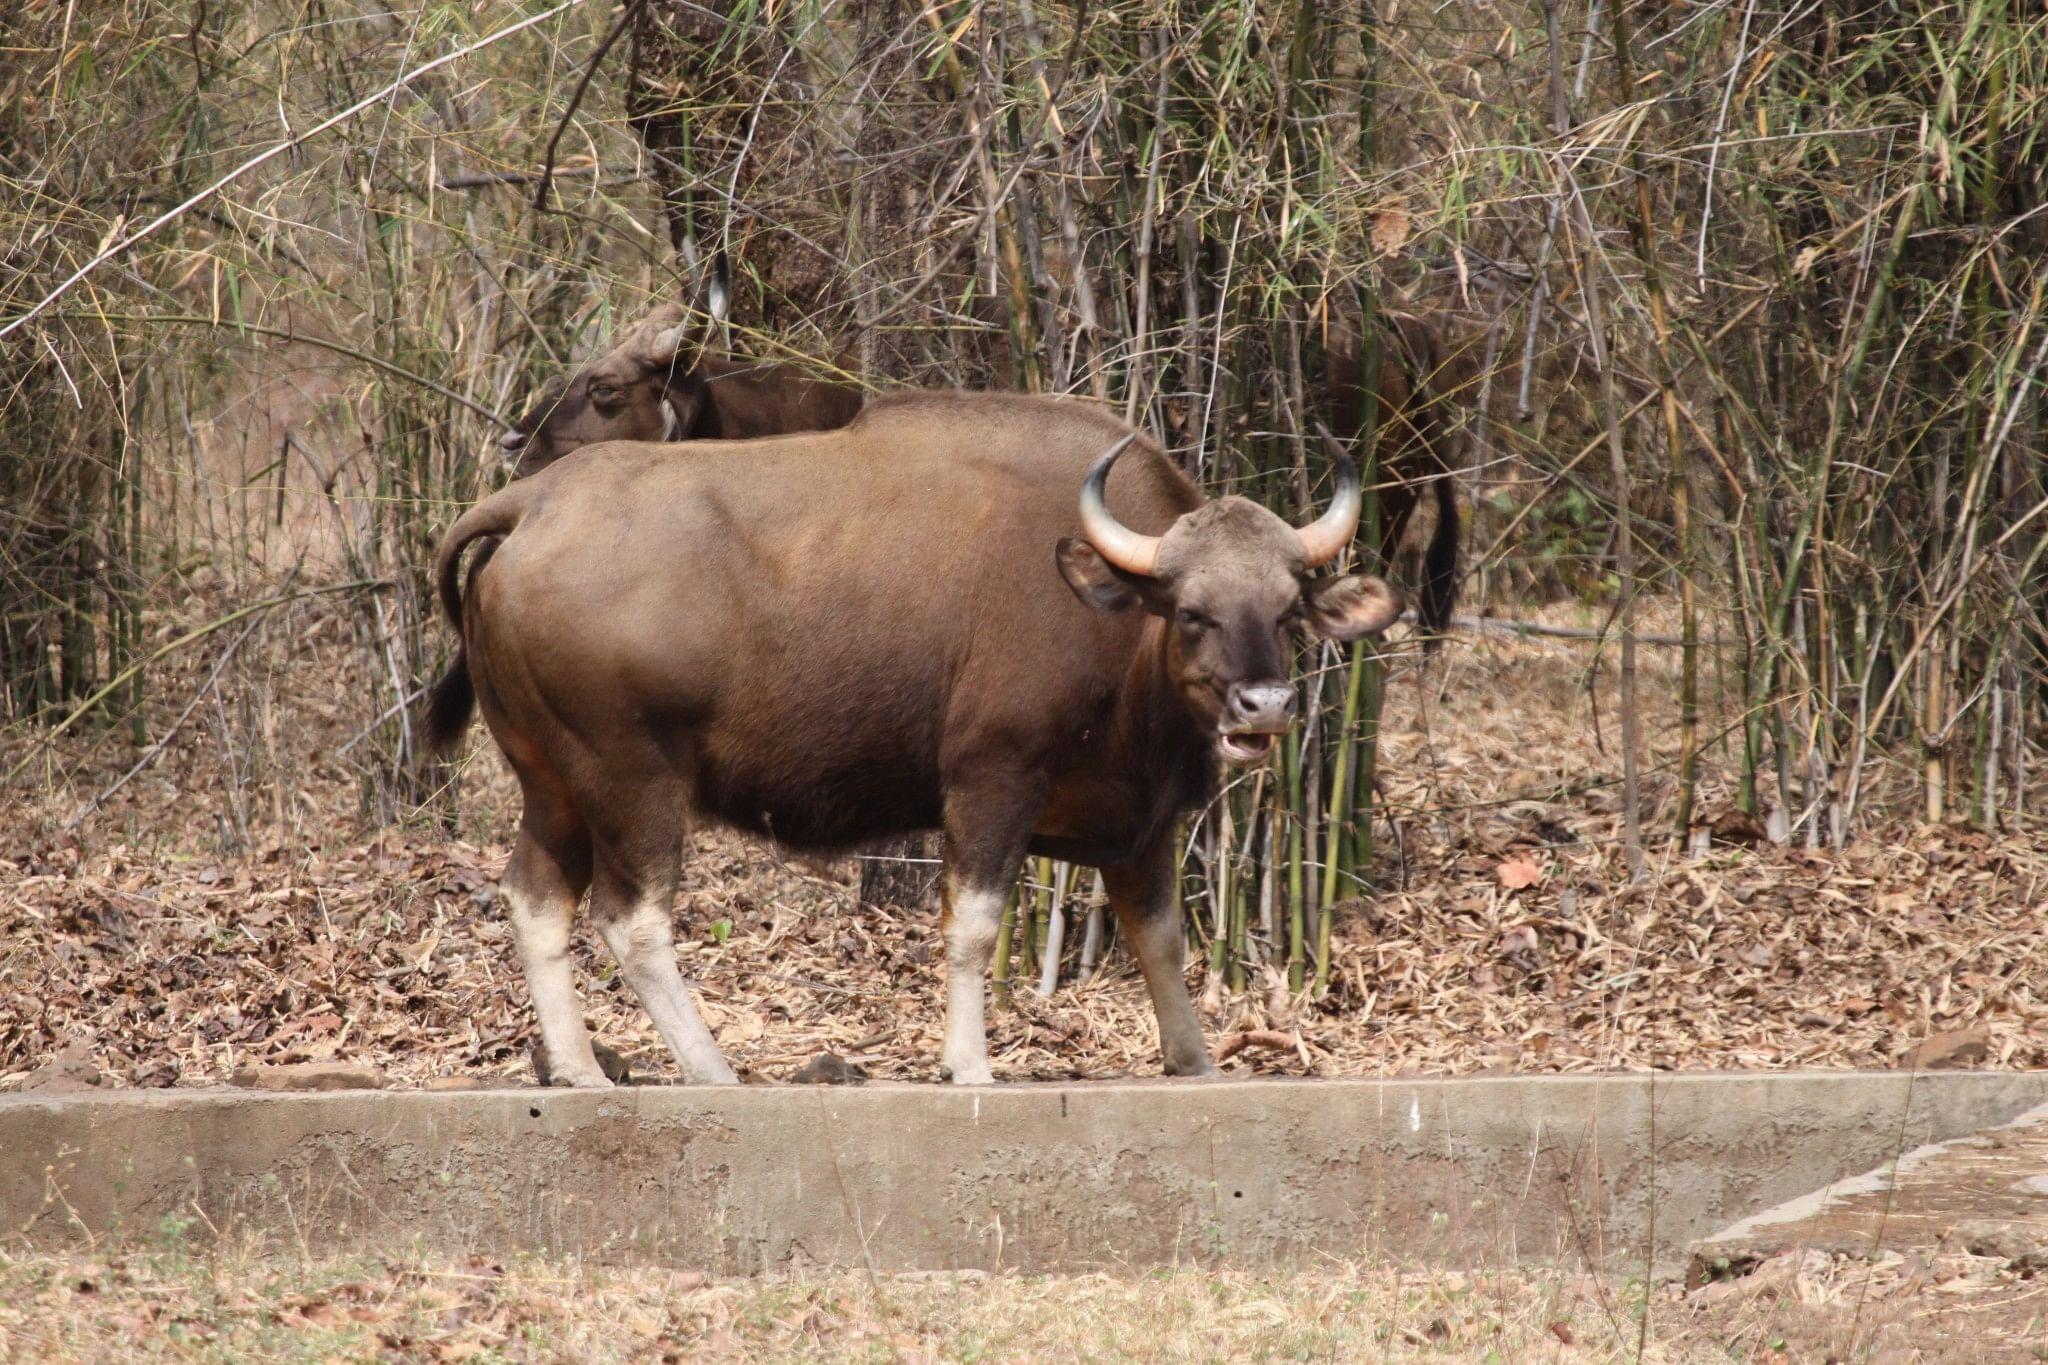 An Indian Gaur